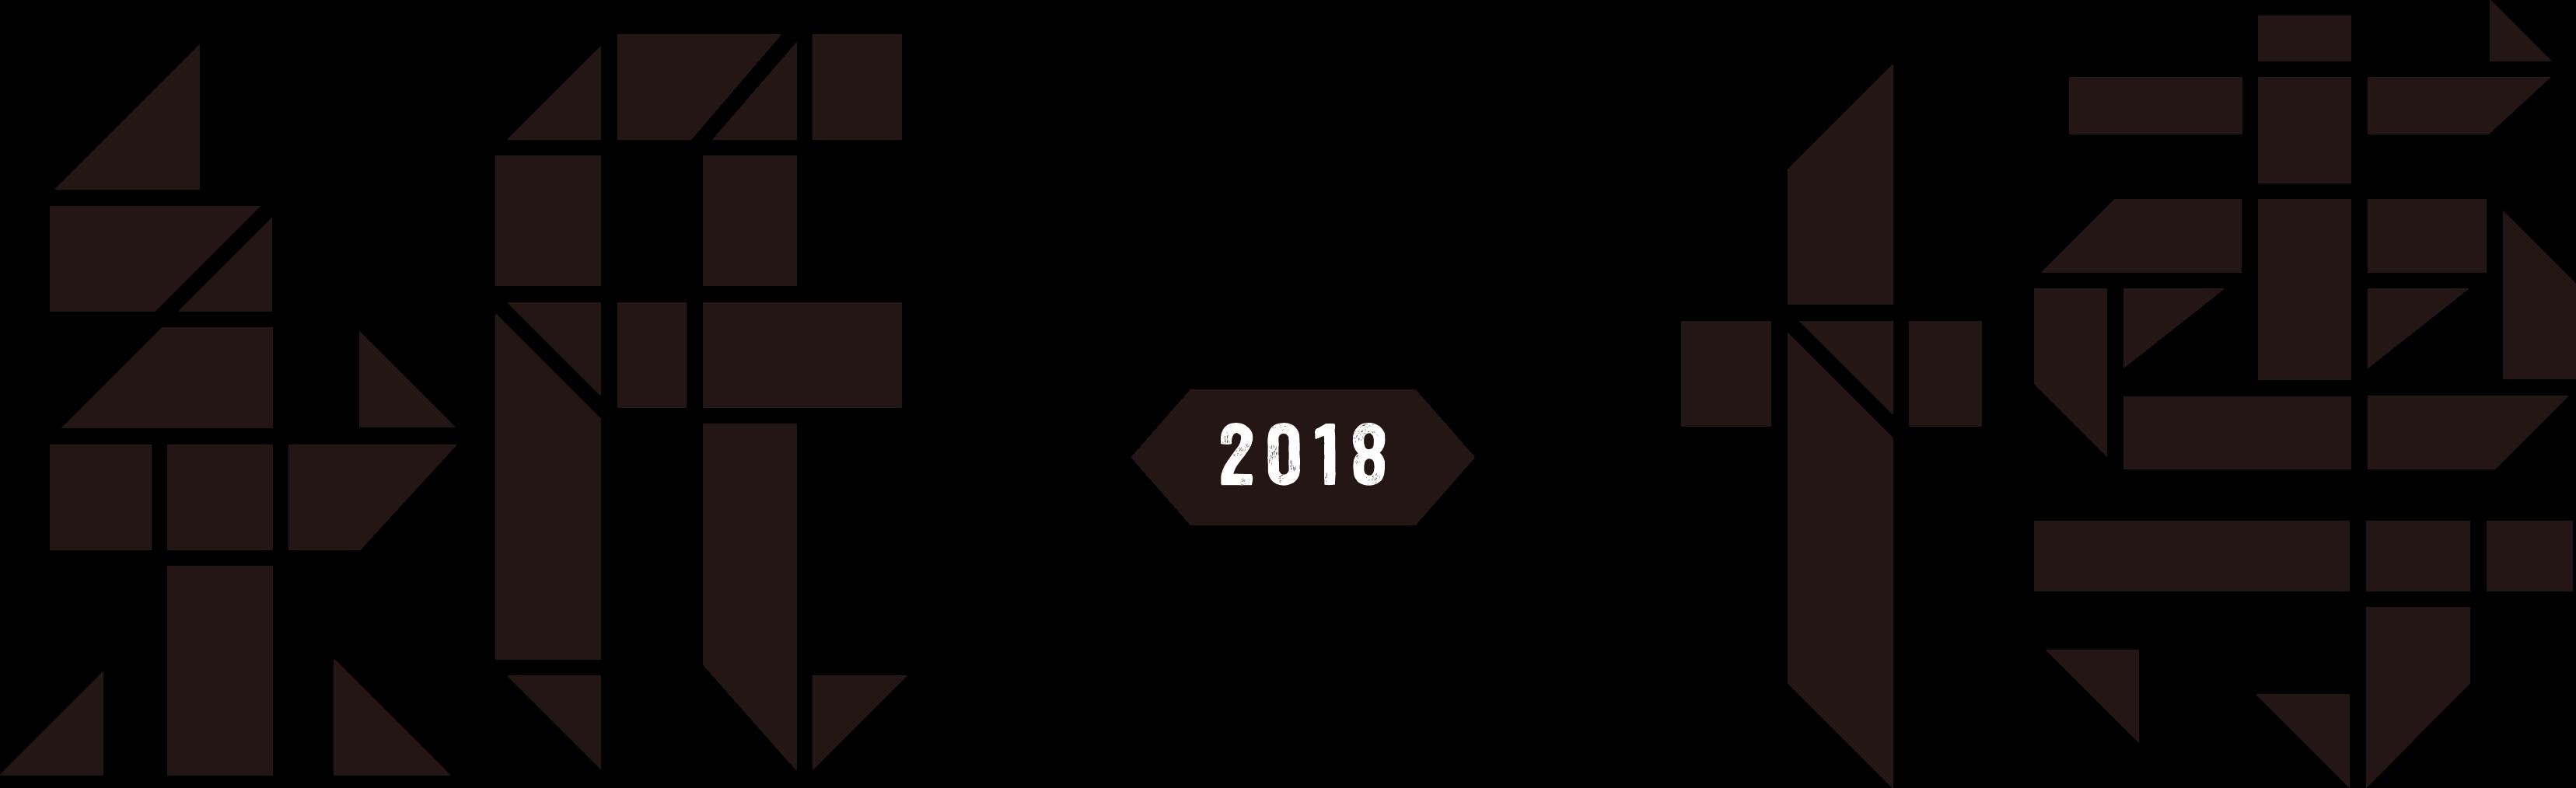 http://kamihaku.jp/2018_summer/wp-content/themes/kamihaku/images/logo.png